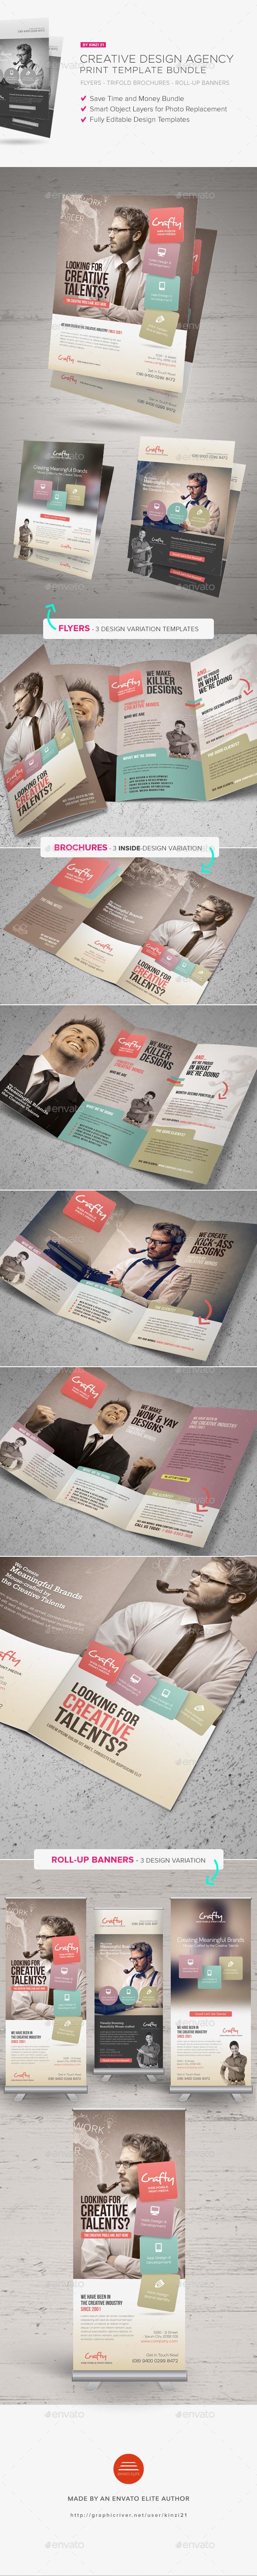 Creative Design Agency Print Bundle - Brochures Print Templates